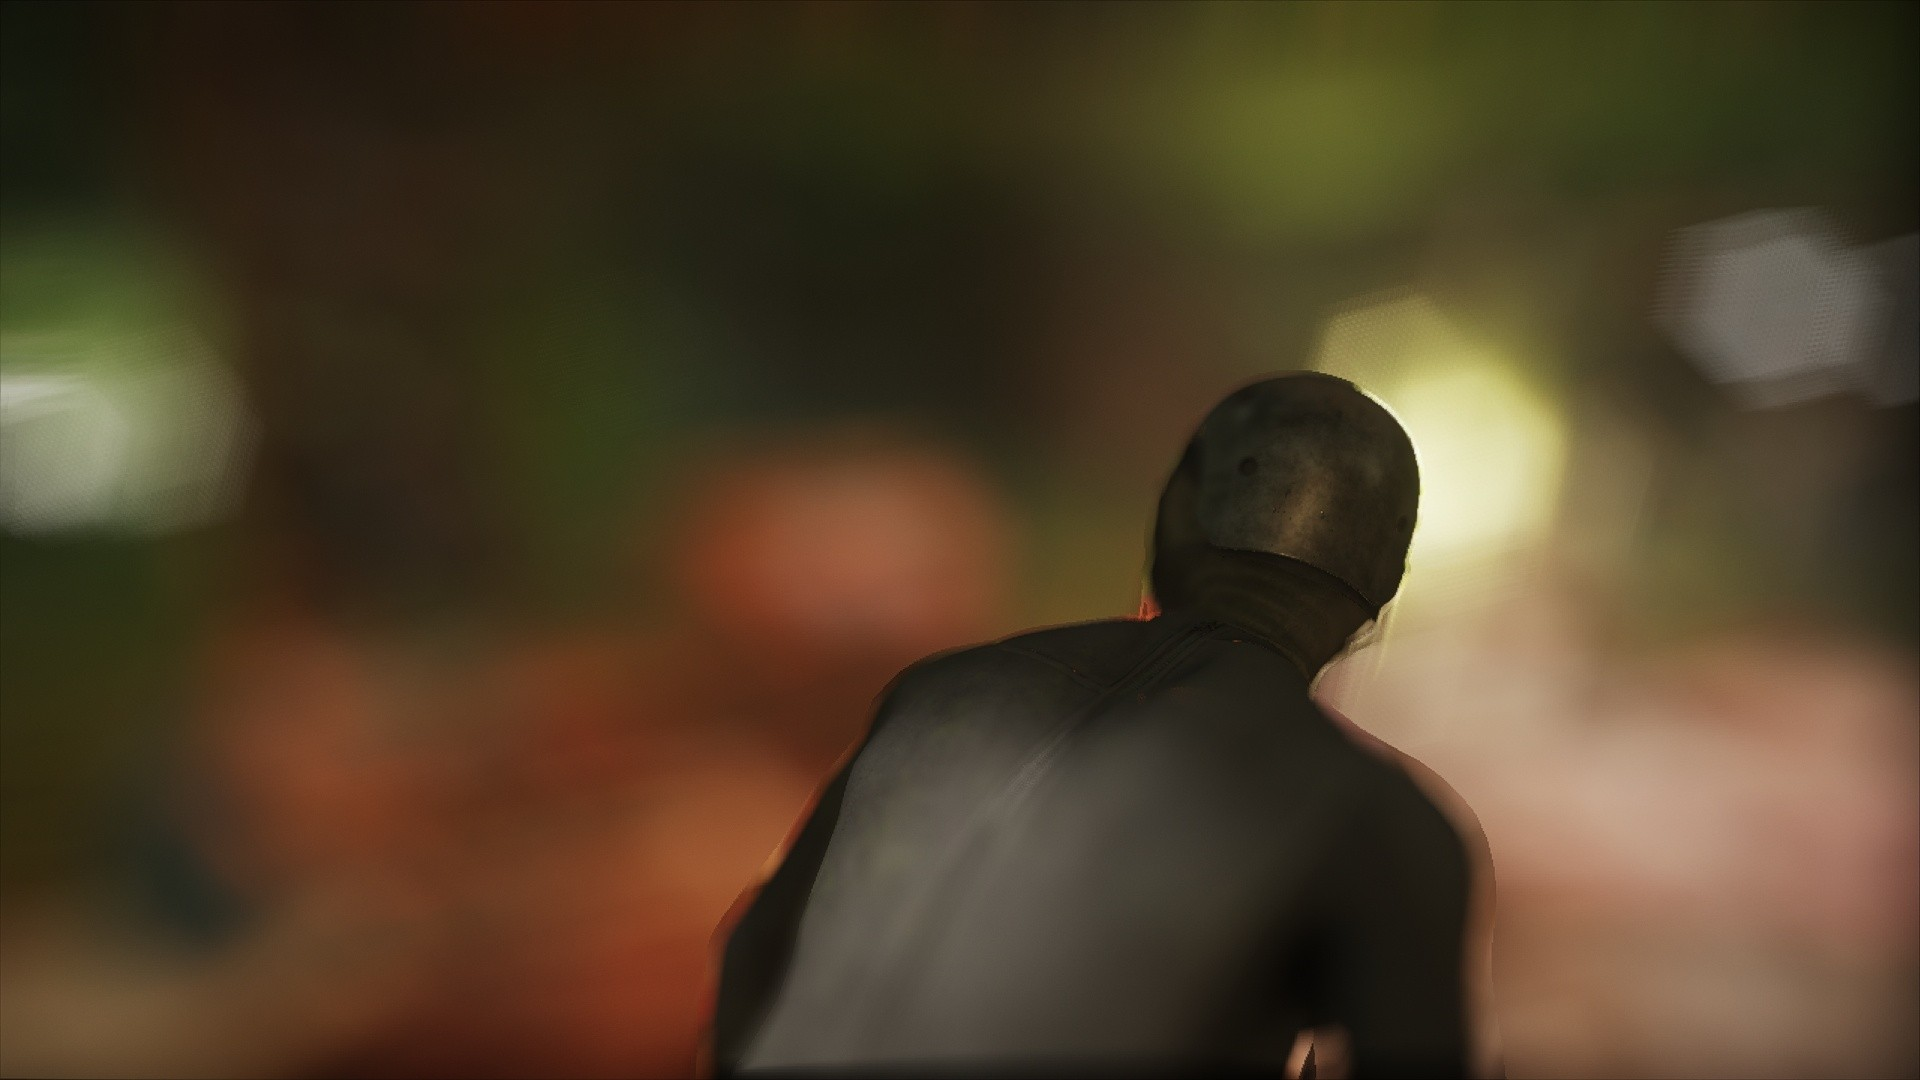 Ghost Recon Breakpoint - личные впечатления от бета-теста и игры в целом